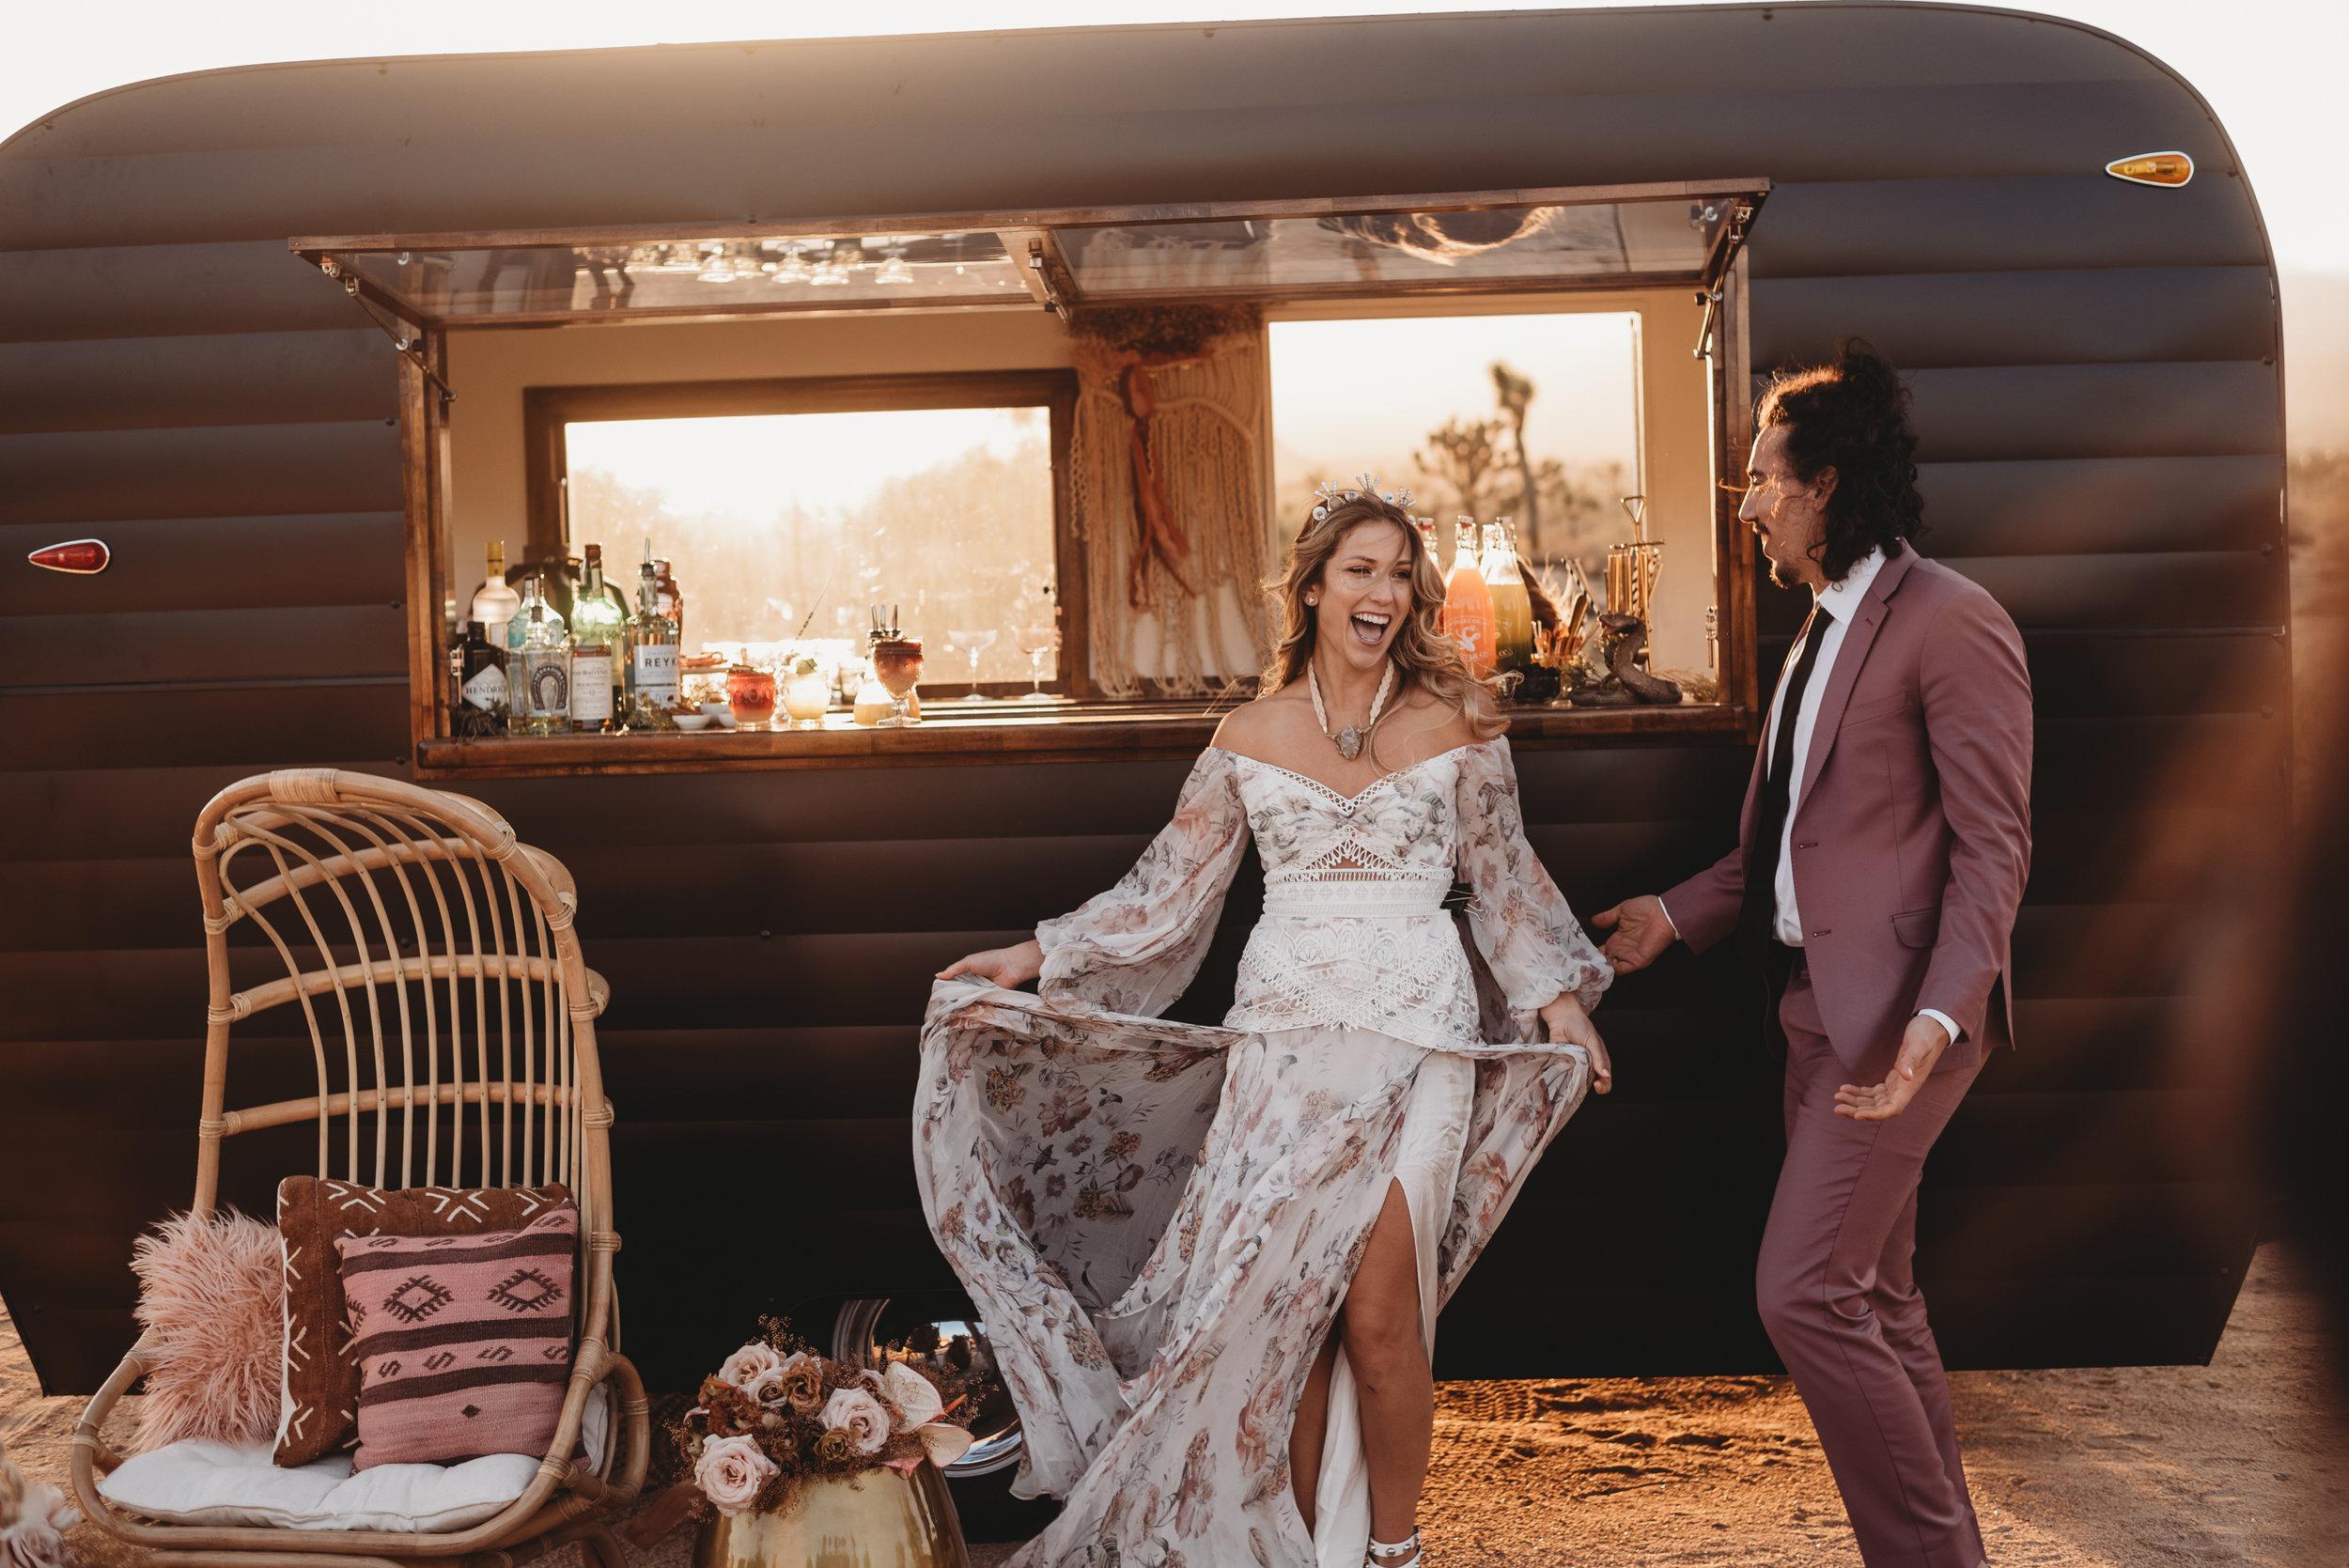 FortSt.John_photographer_TyraEPhotography_Wedding_Couple_Family_Photograhy_DawsonCreek_Elopement_Bride_Boduoir_Portraits-8368.jpg